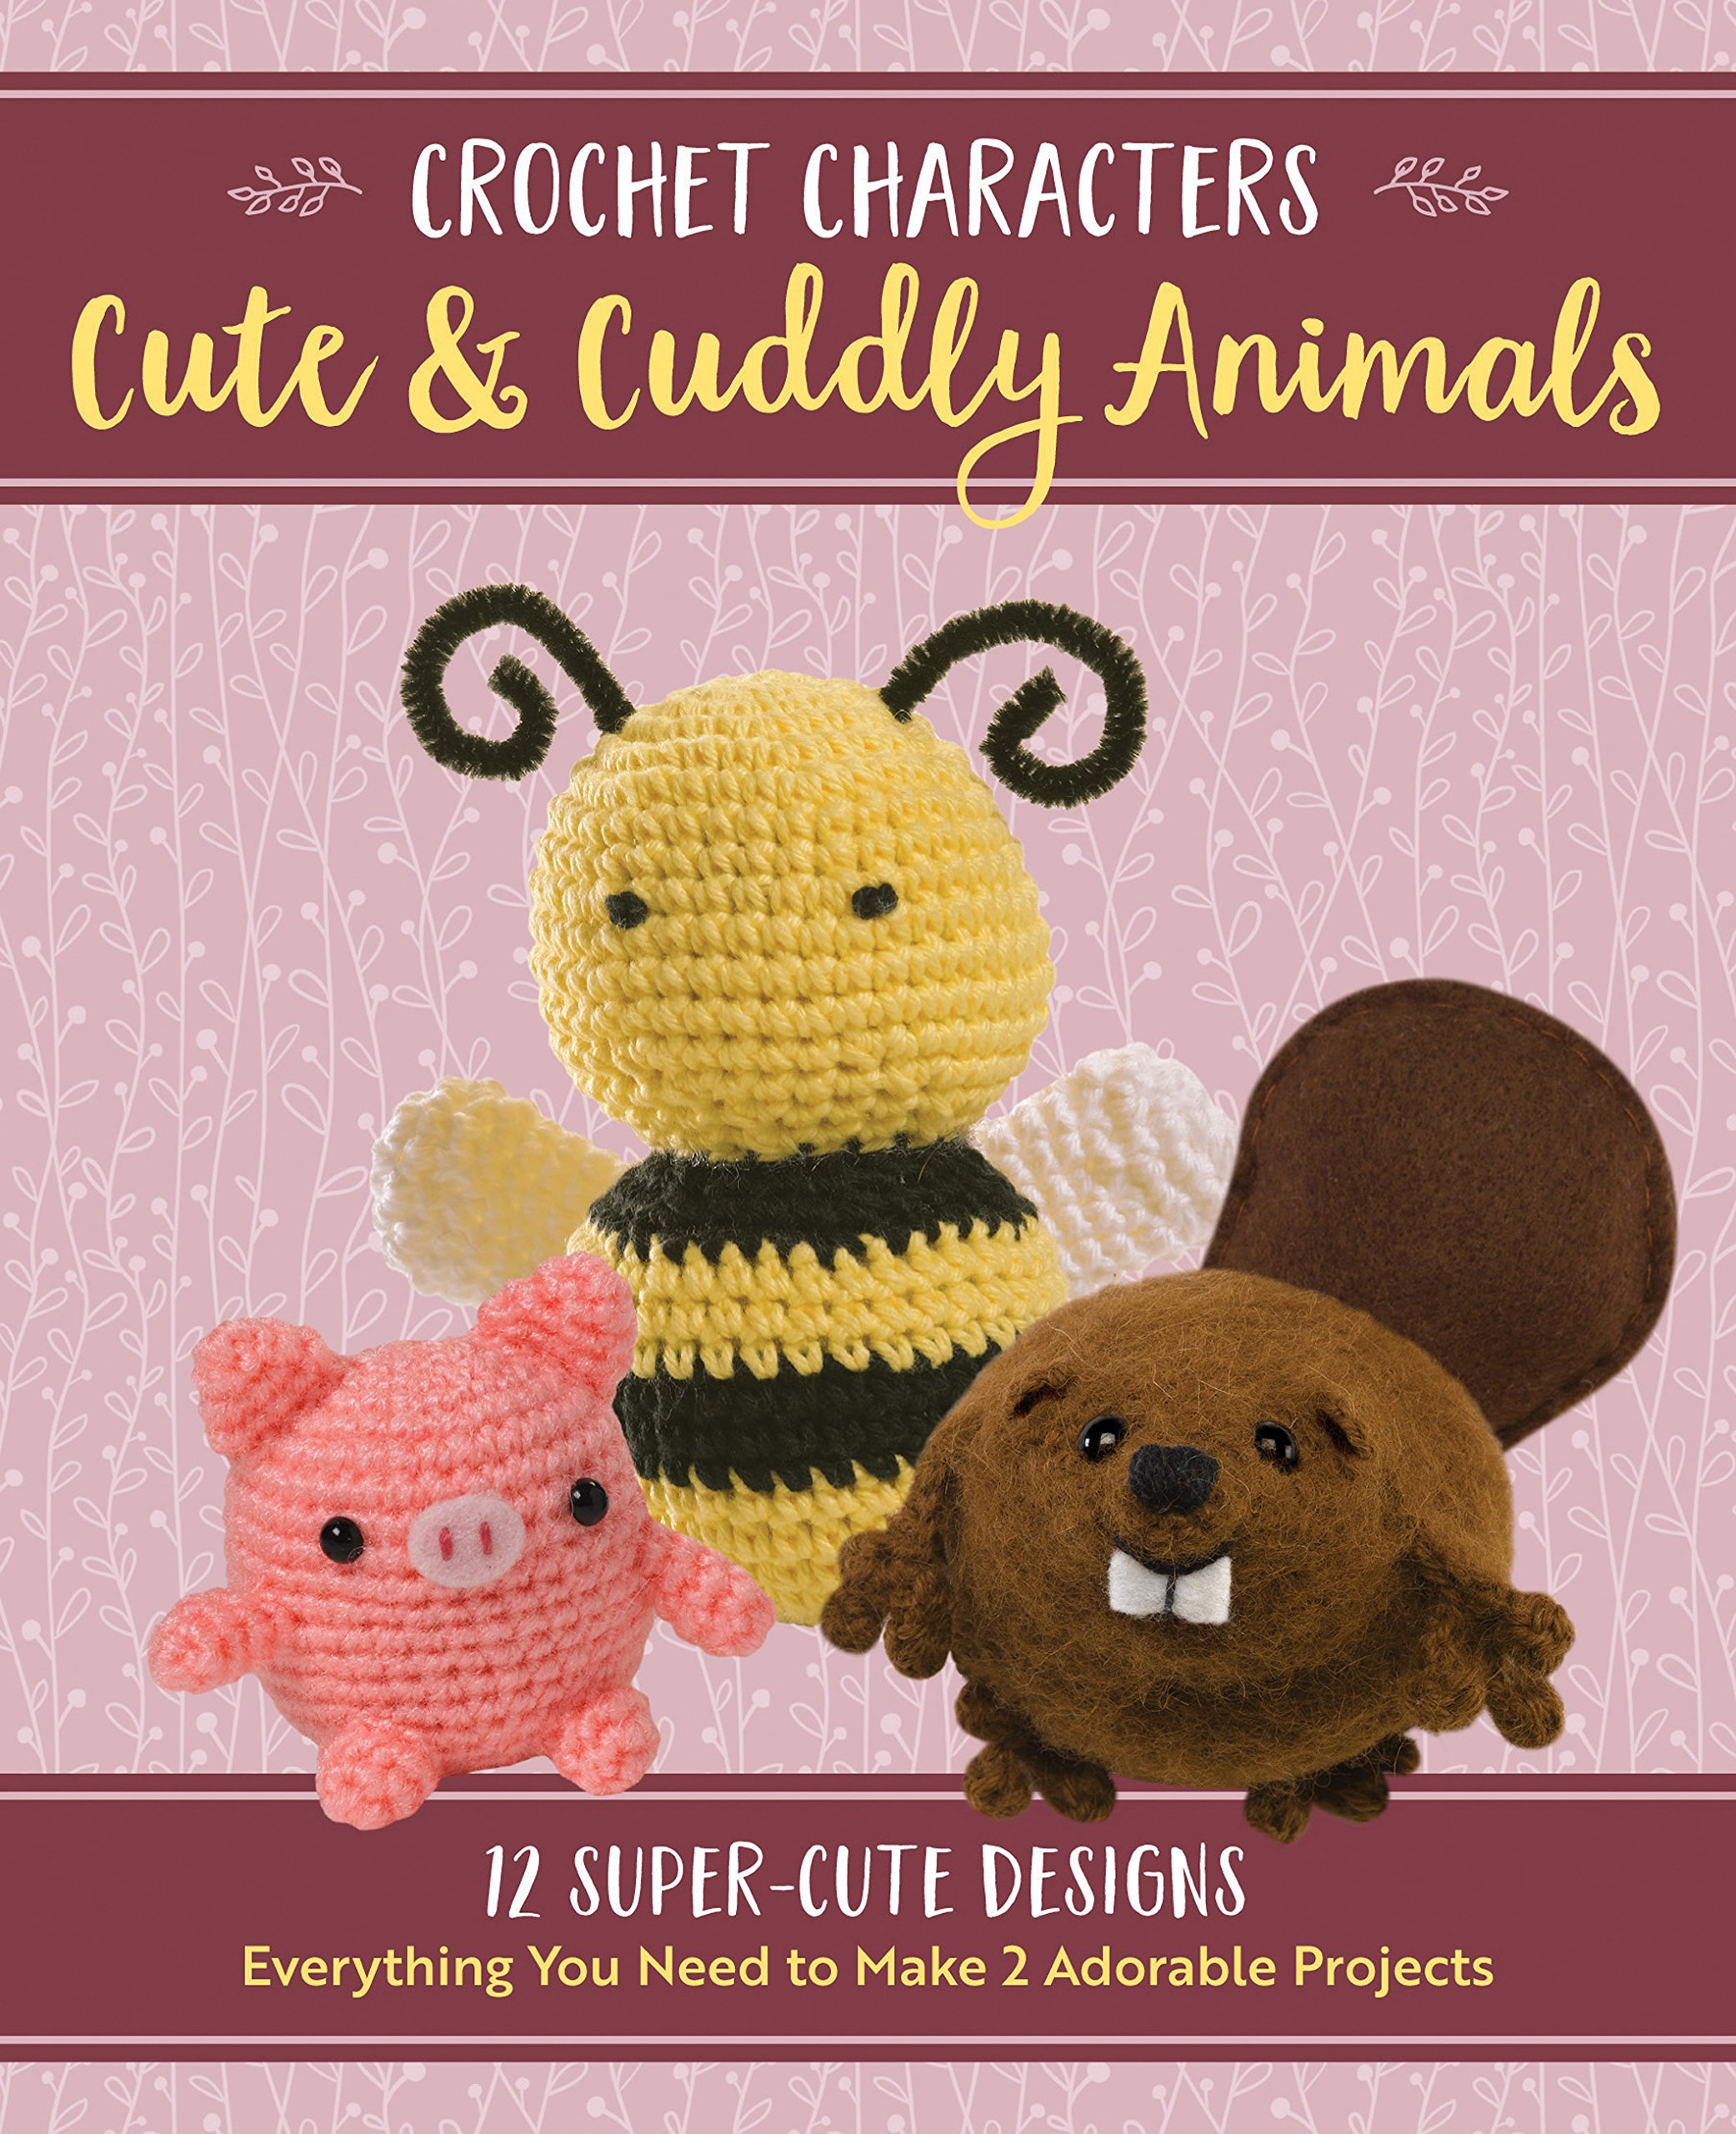 Crochet The Coolest Cartoon Characters | Crochet, Cool cartoons ... | 2560x2083